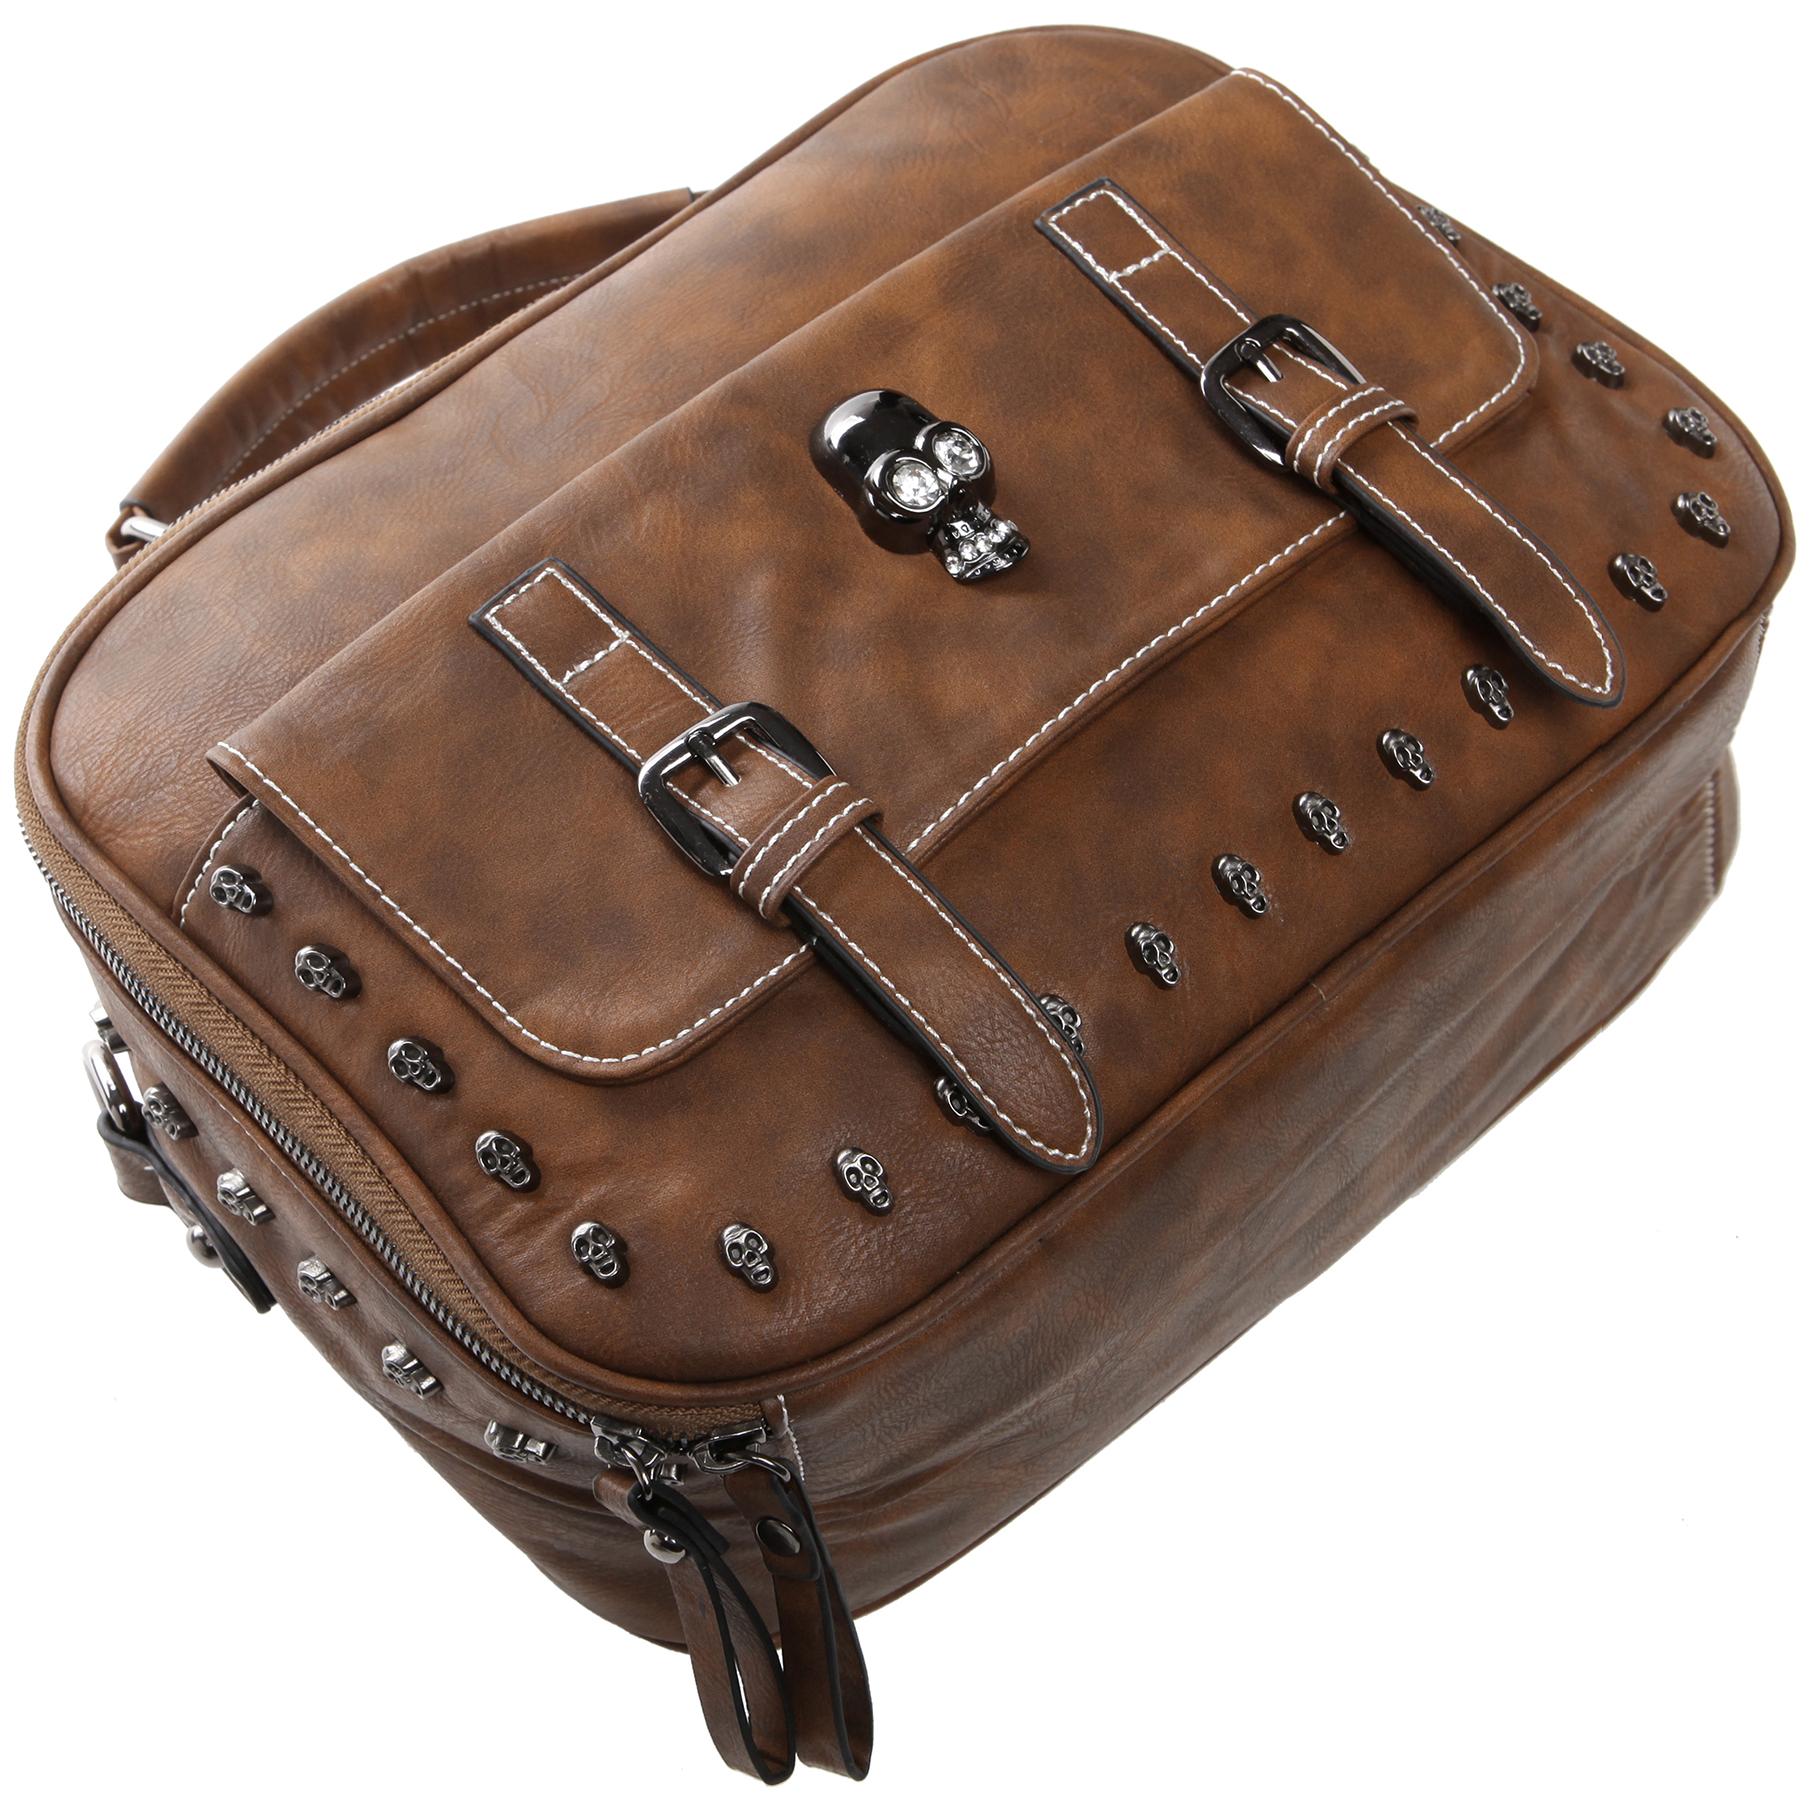 Women's Designer Handbag MASON in Brown Gothic Style Satchel laying flat image